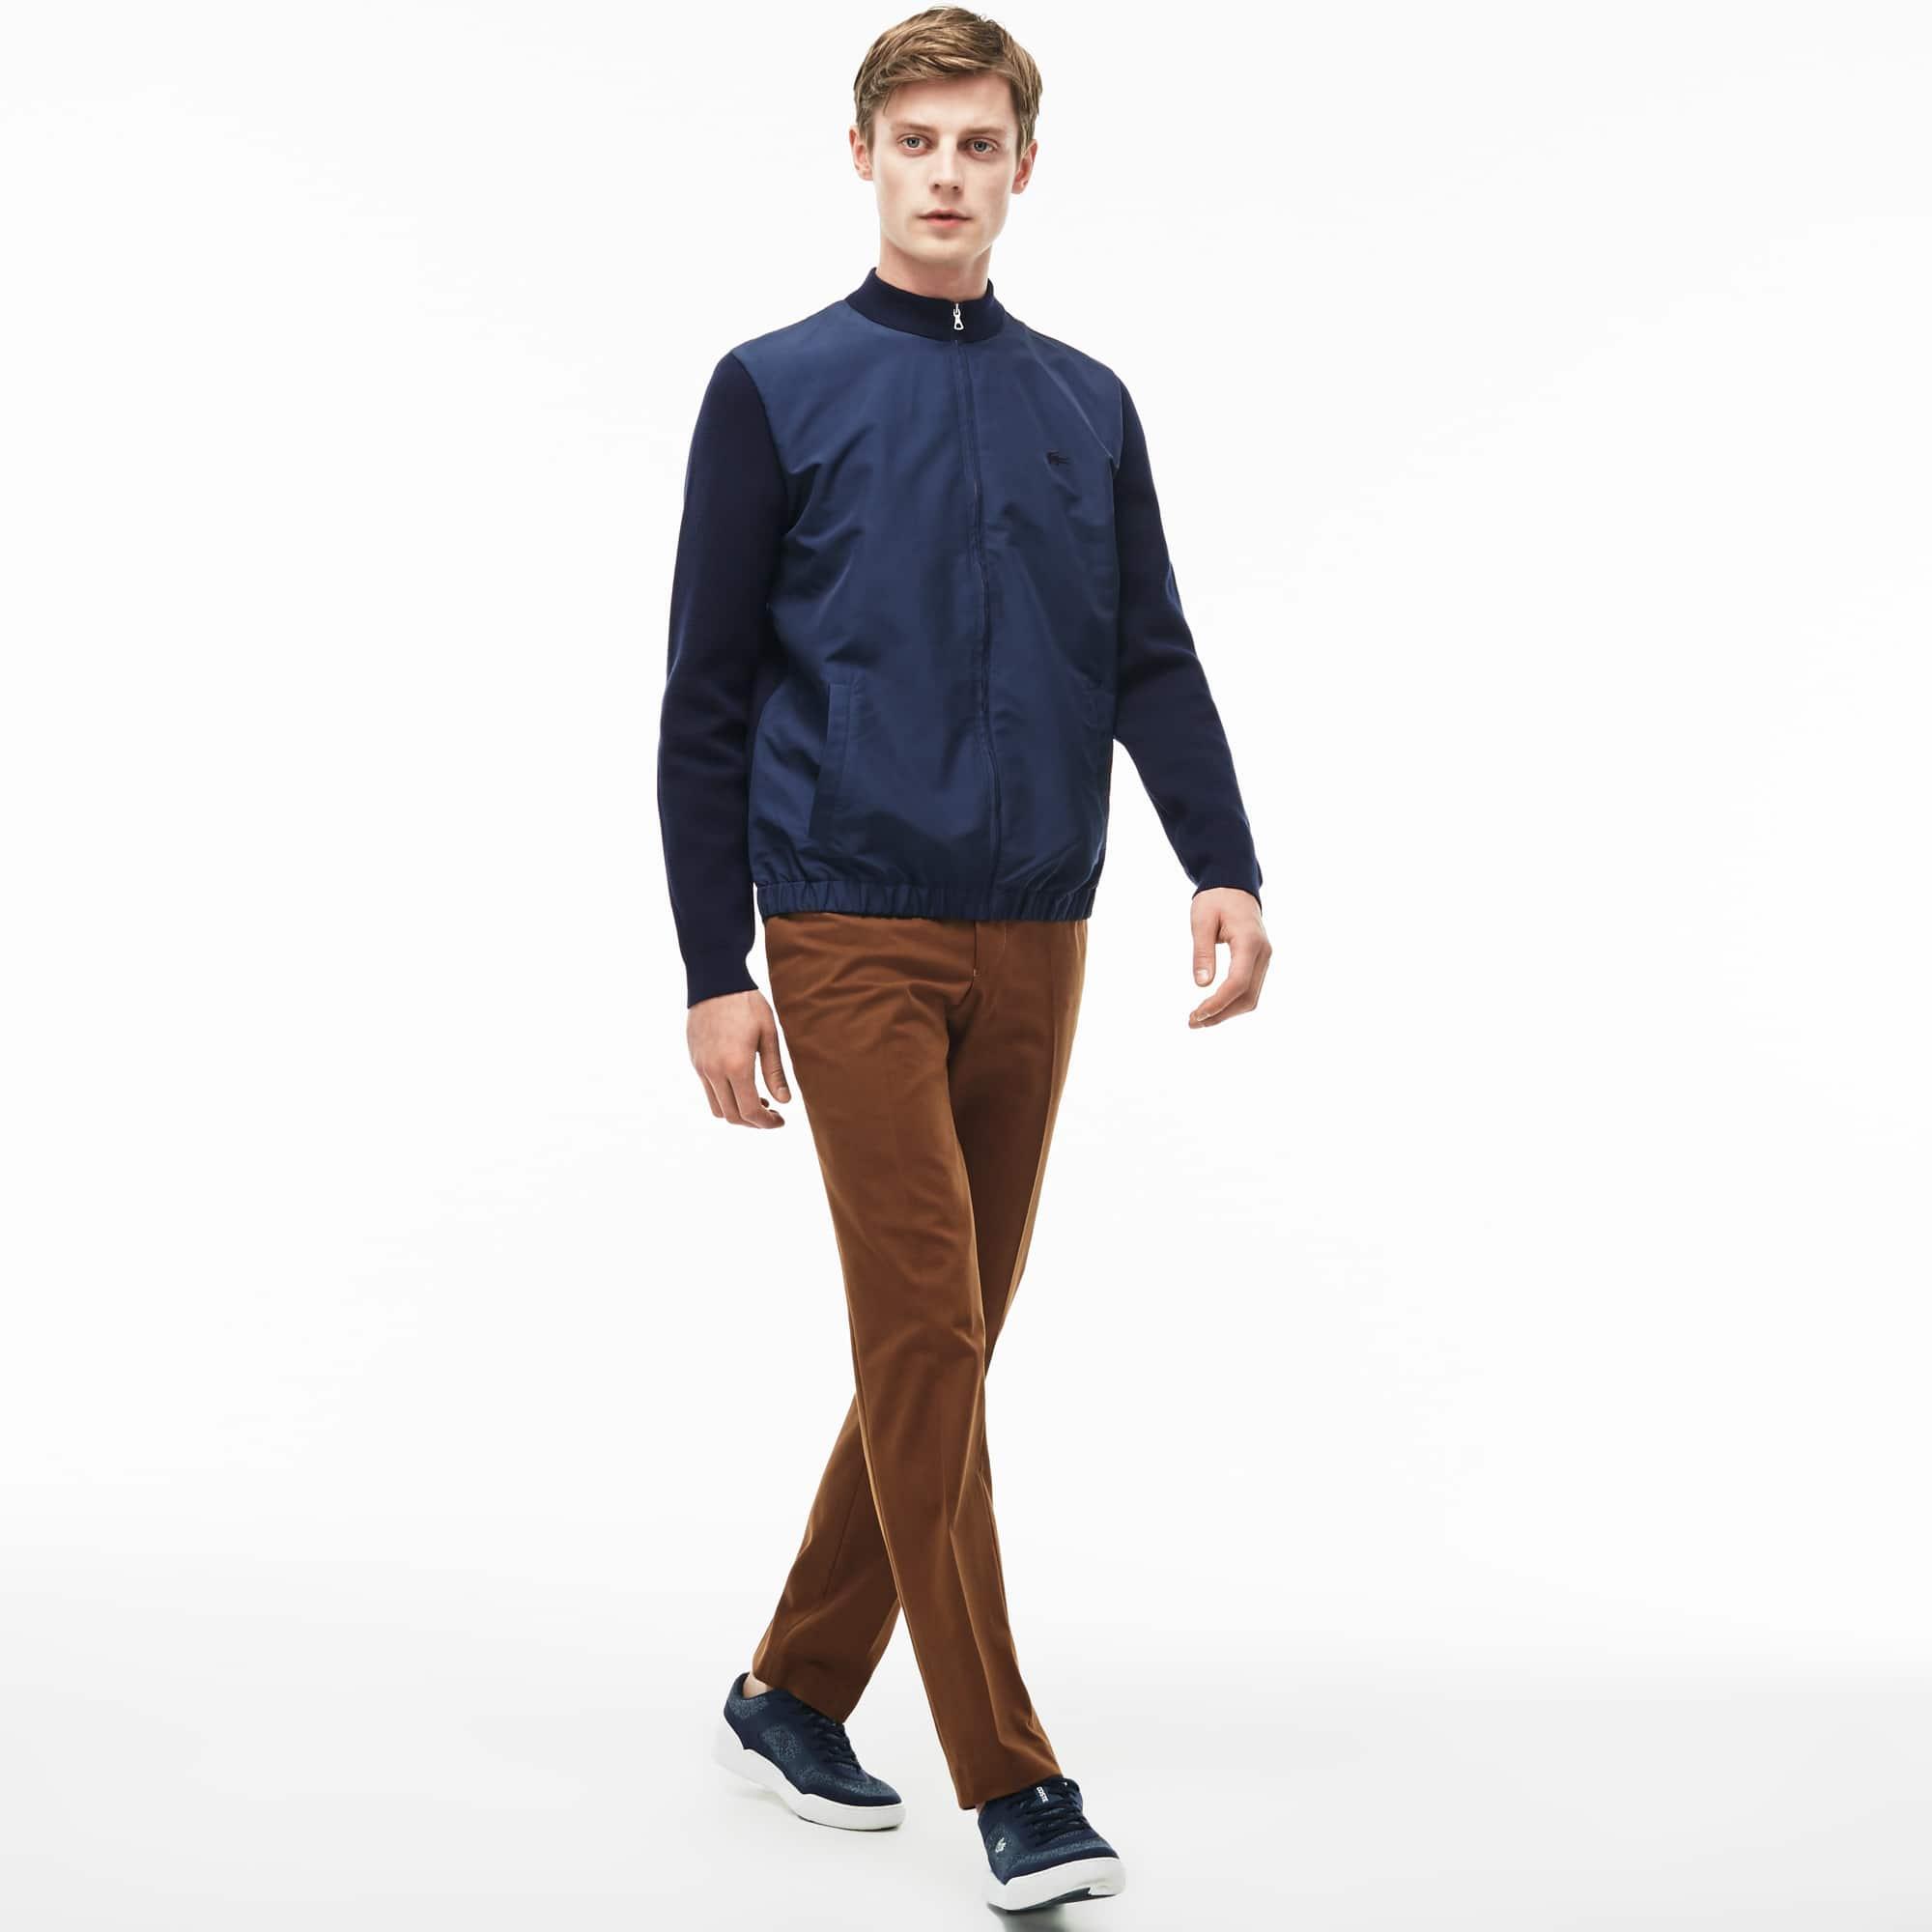 Men's Slim Fit Pleated Stretch Gabardine Chino Pants